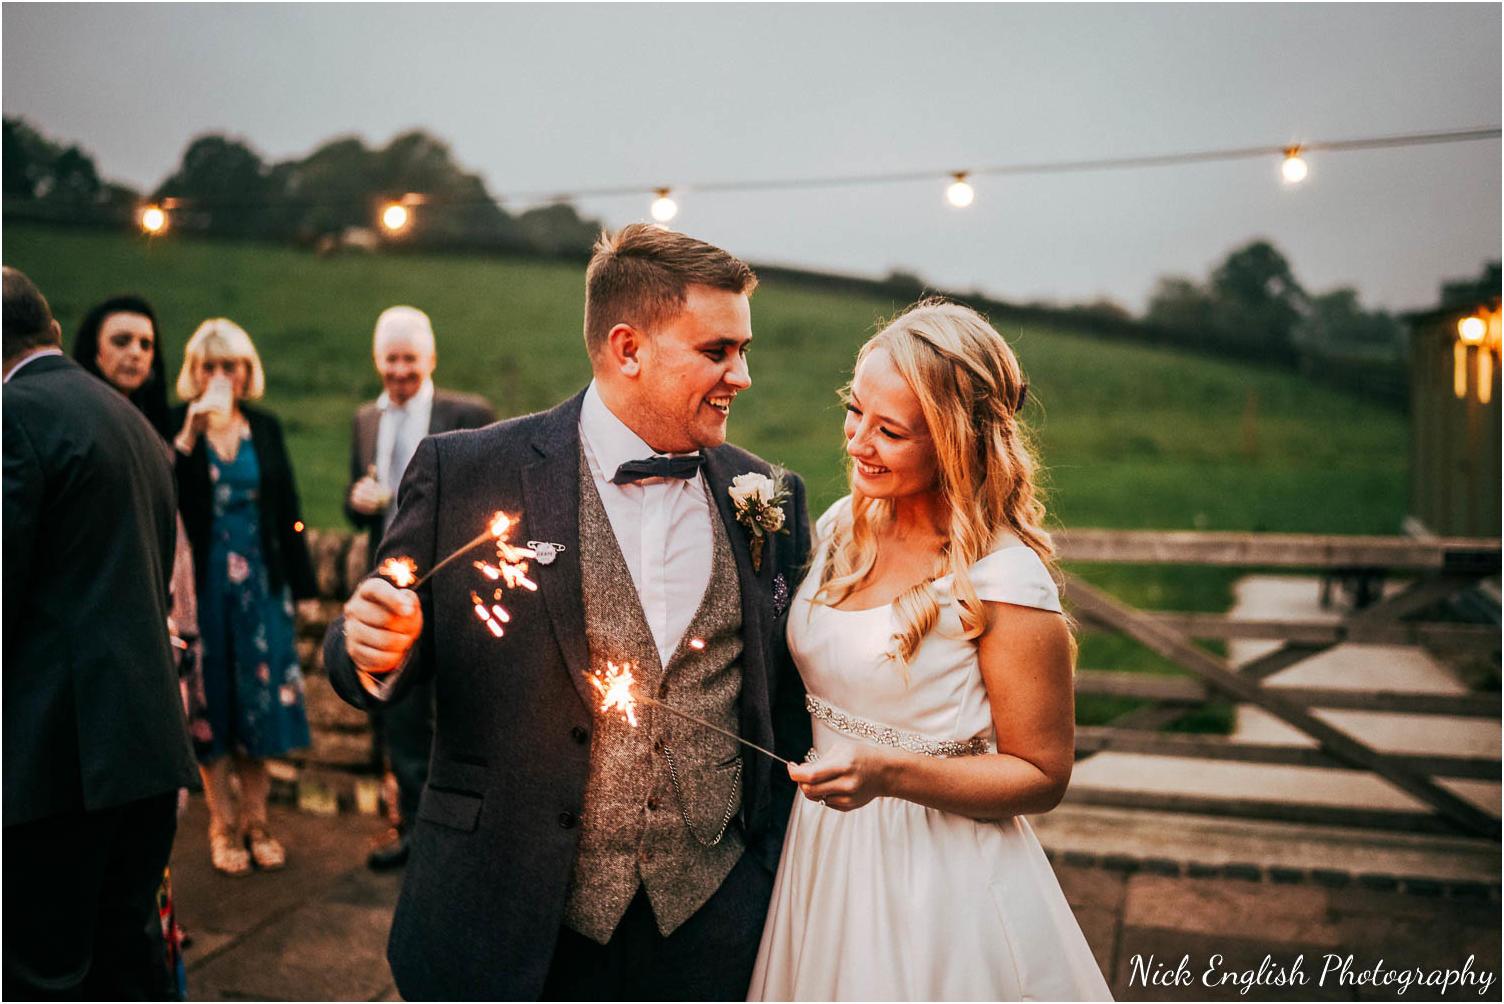 The_Ashes_Barn_Endon_Stoke_Wedding_Photographer-143.jpg